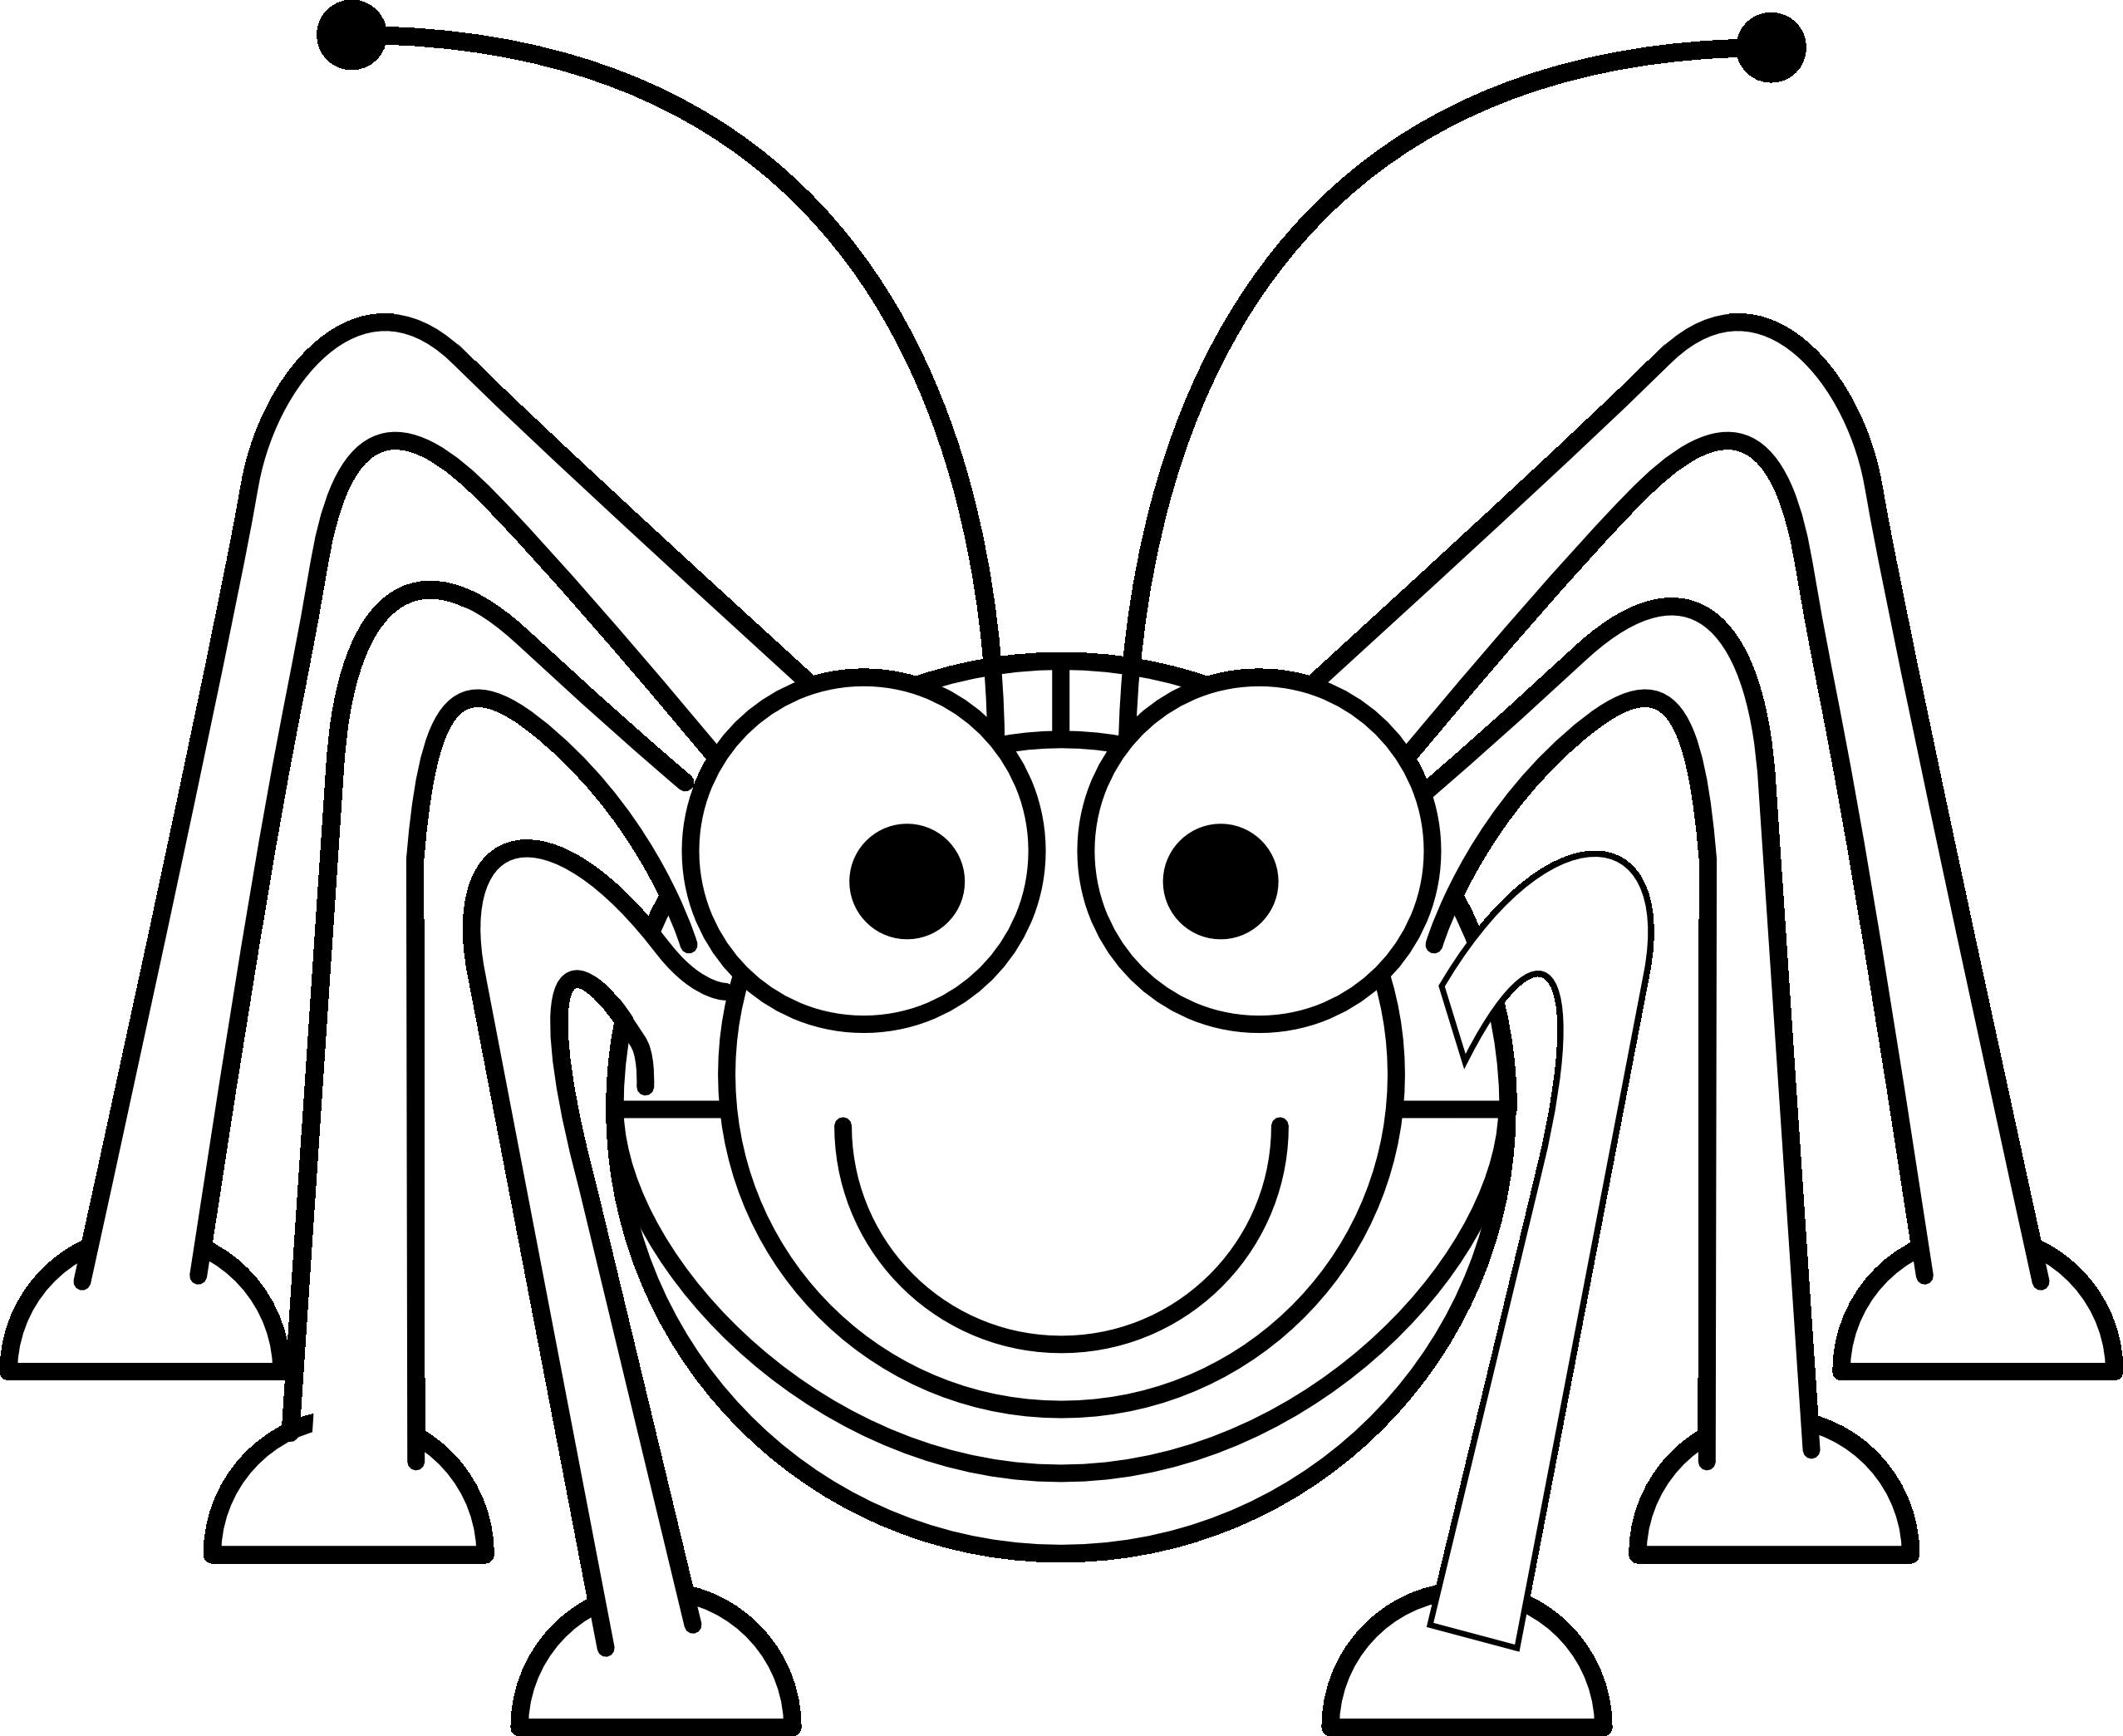 Grasshopper black and white. Cricket clipart quick